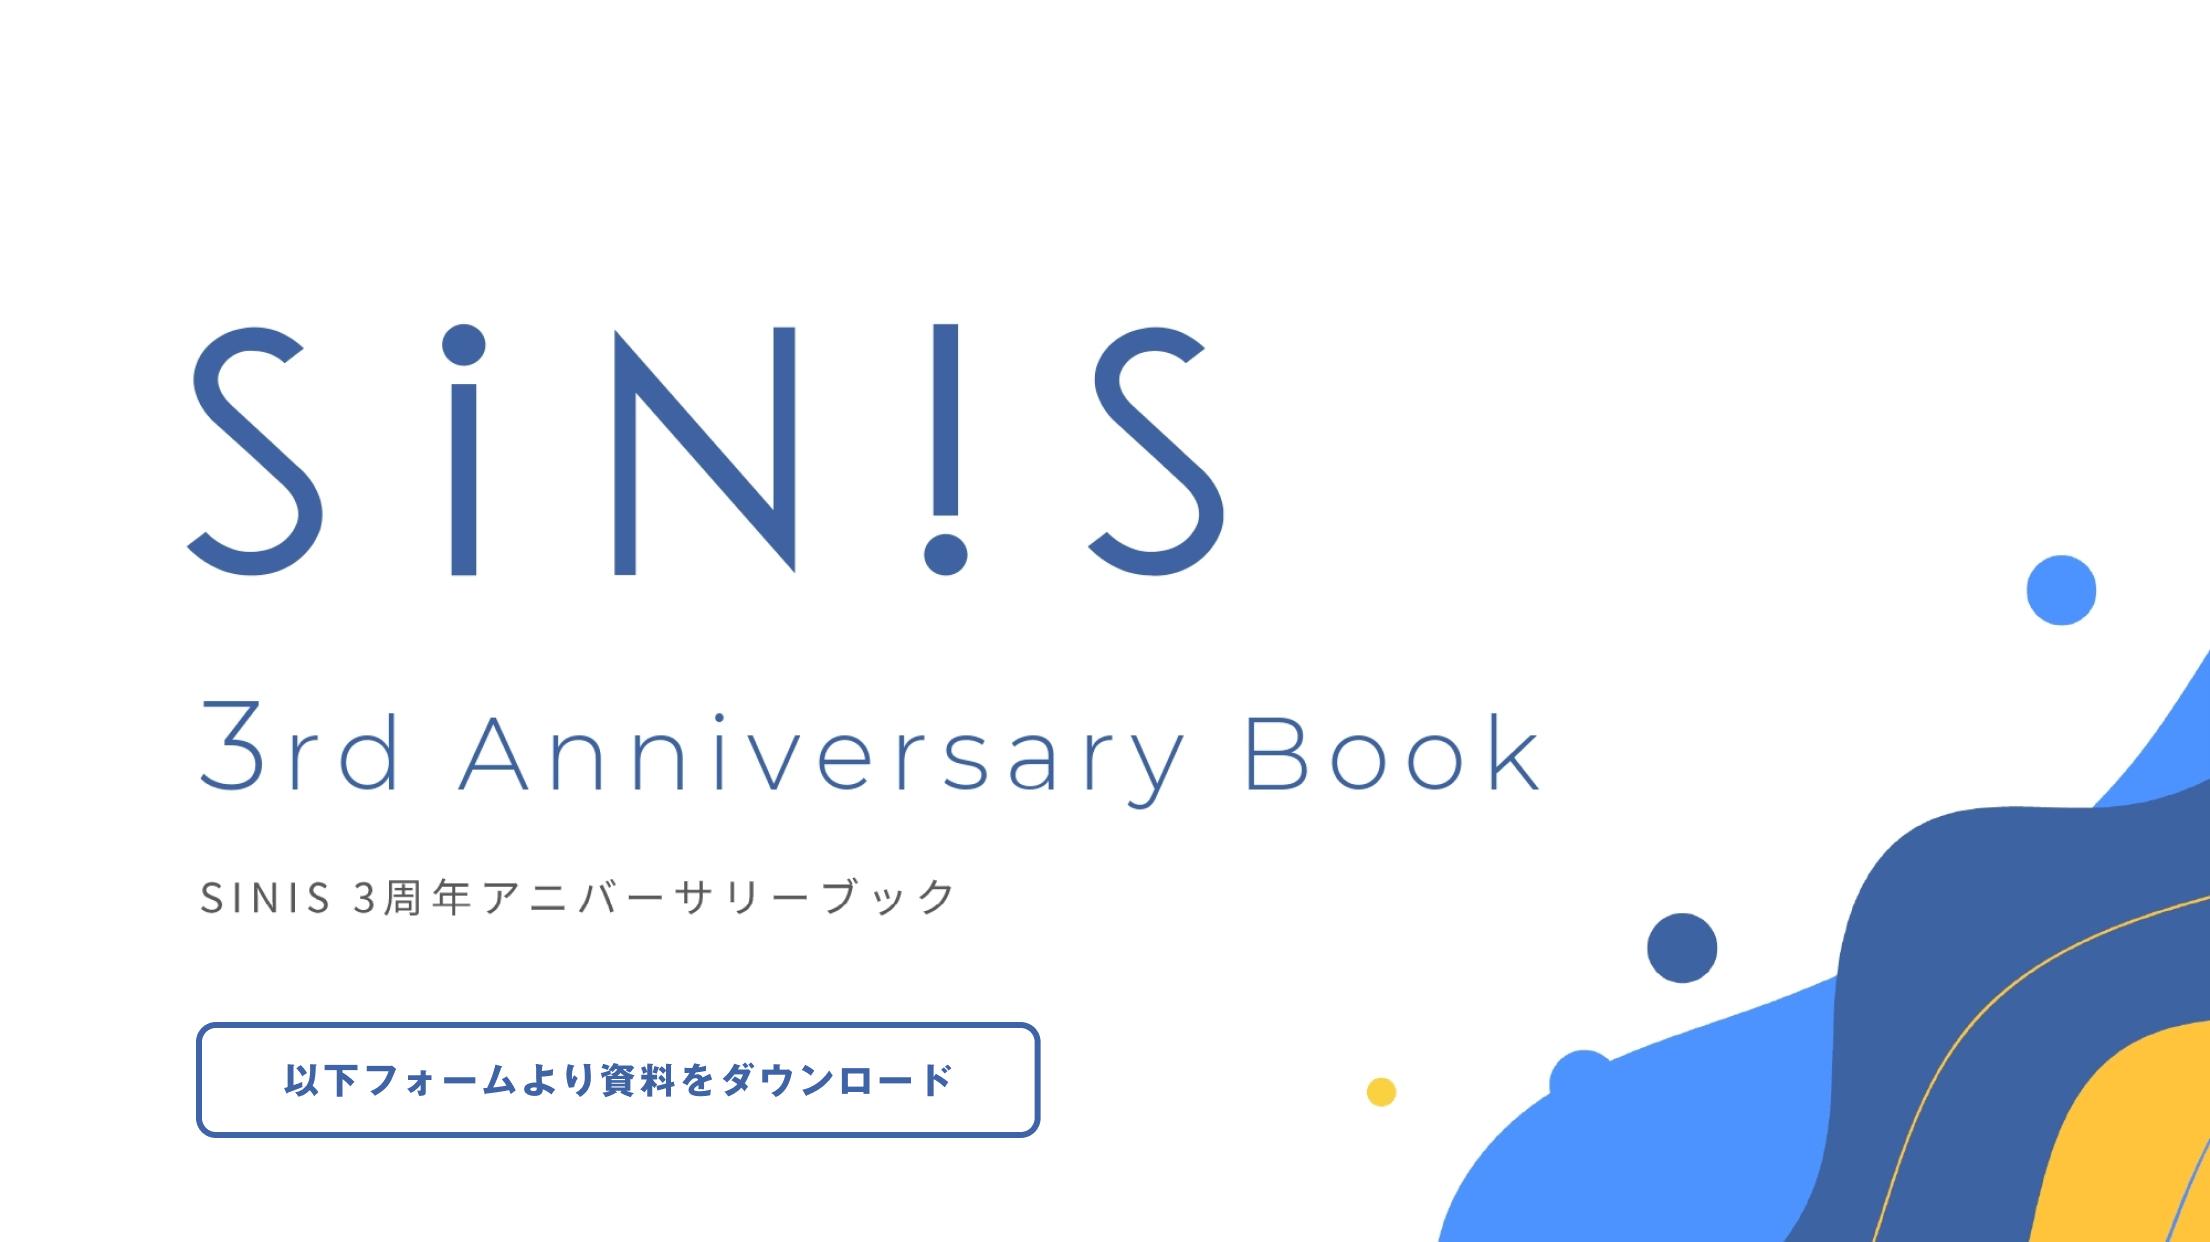 SINIS 3rd Anniversary Book(ダウンロード)